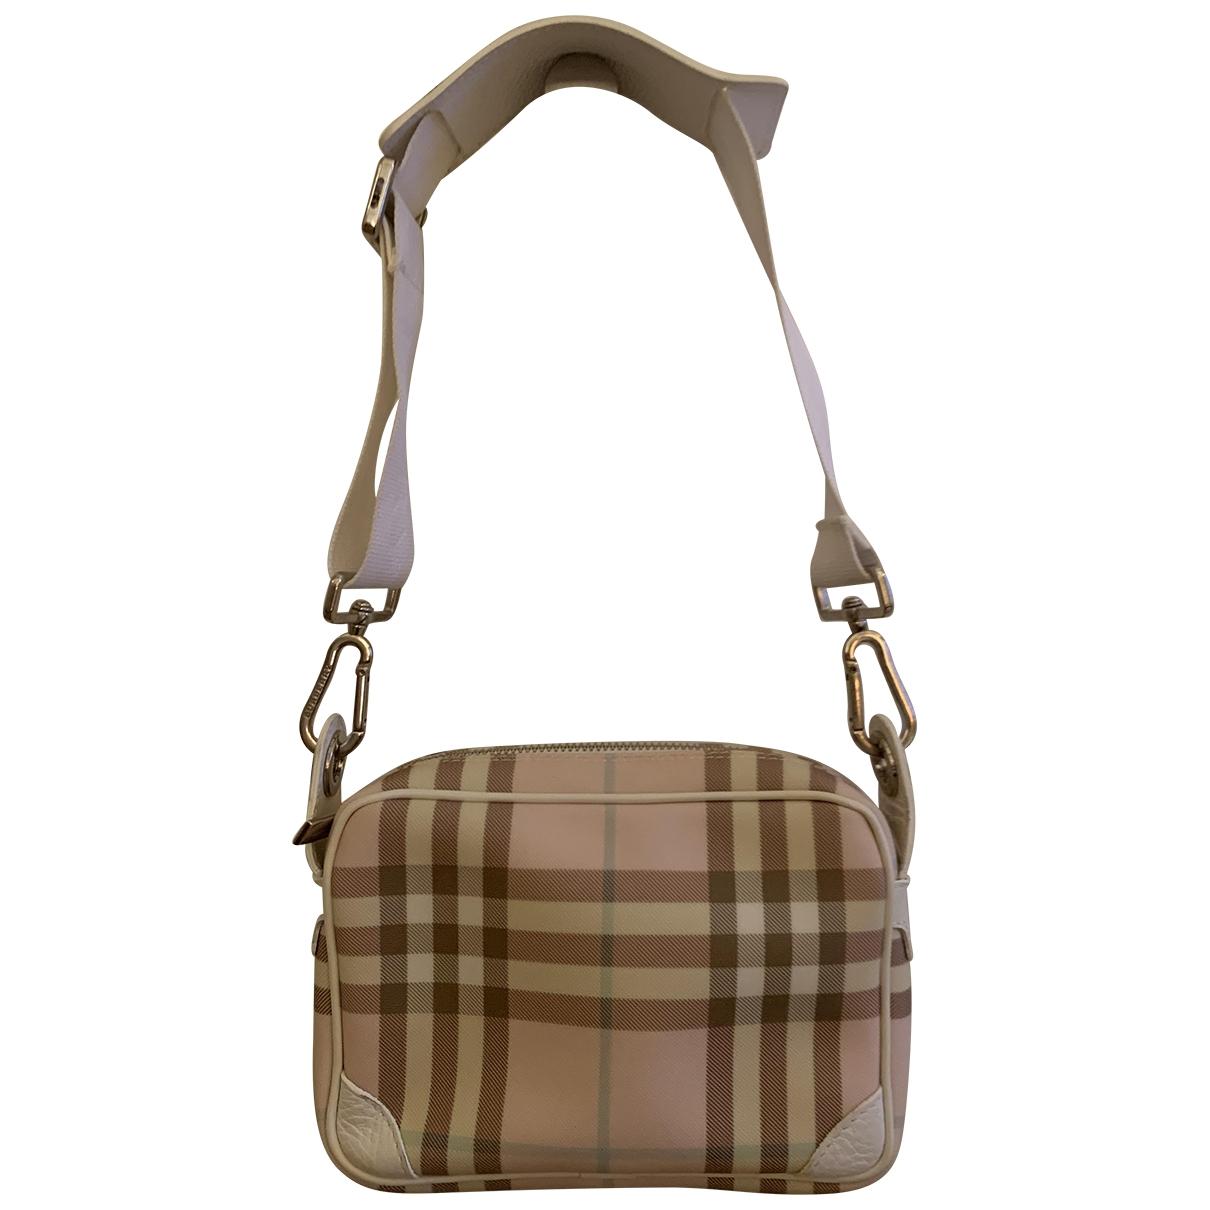 Burberry \N Pink handbag for Women \N